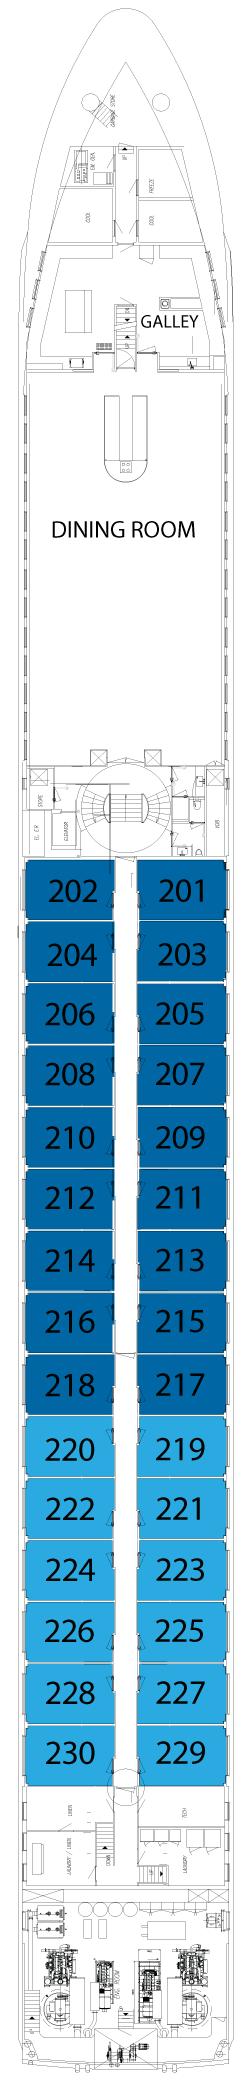 Avalon Affinity Sapphire Deck